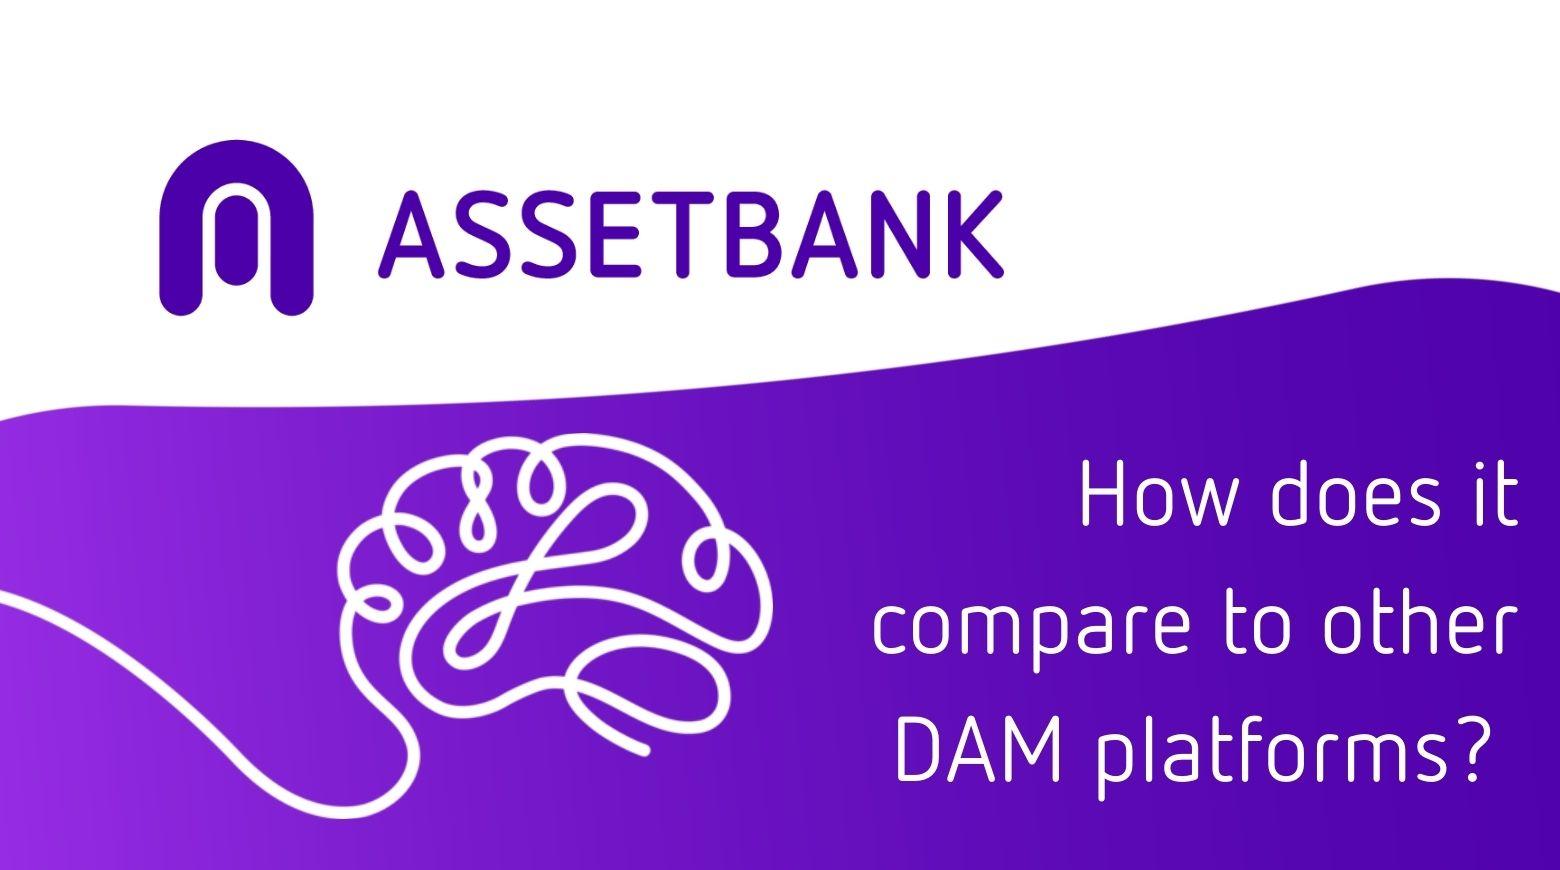 Asset bank competitors